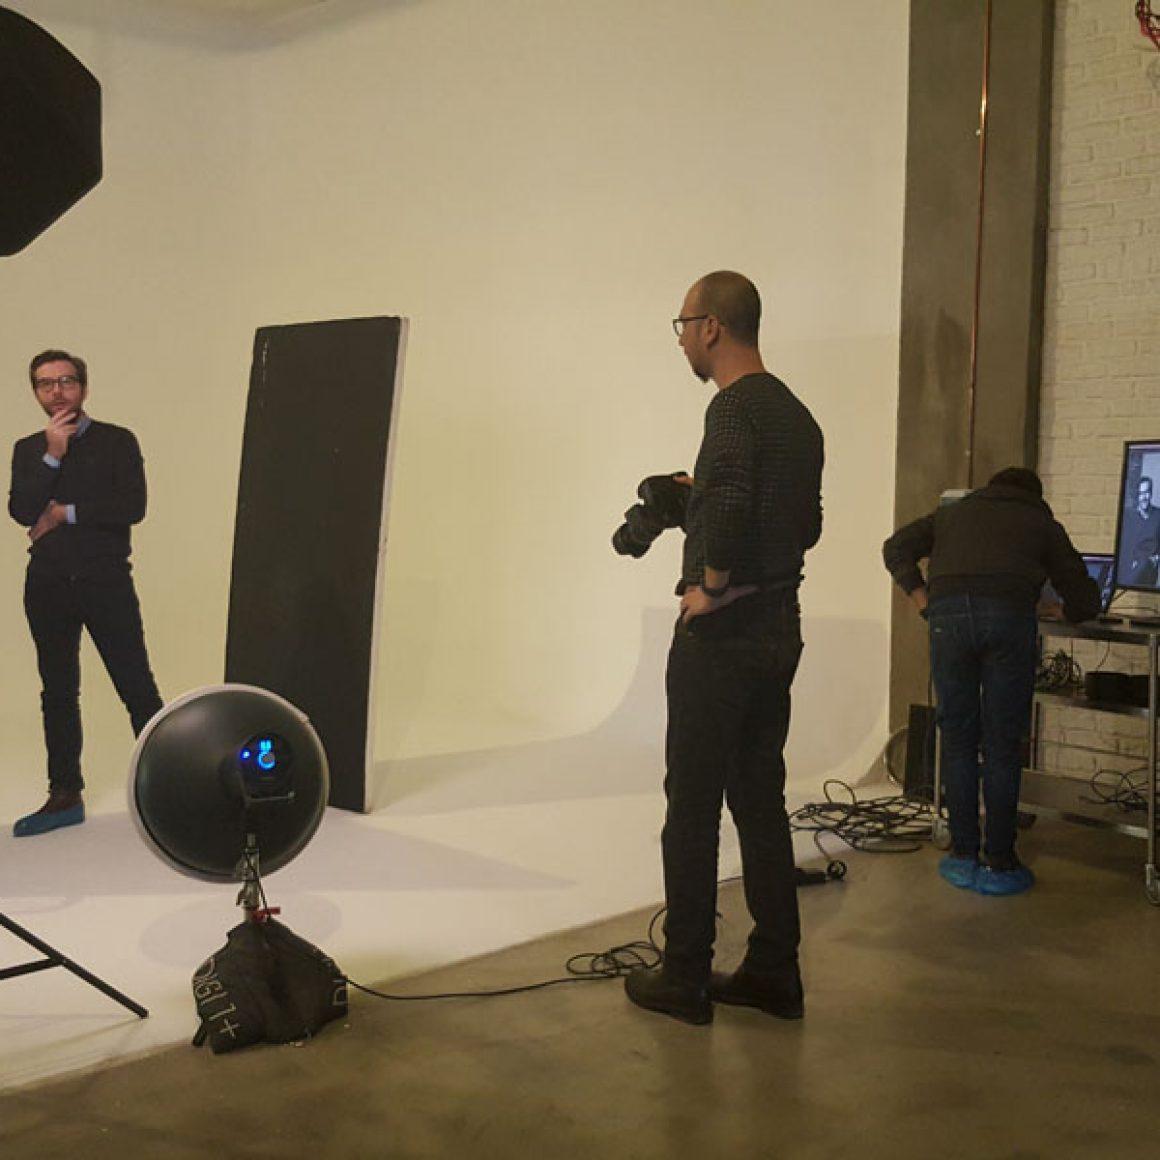 derin15 kurumsal fotograf backstage